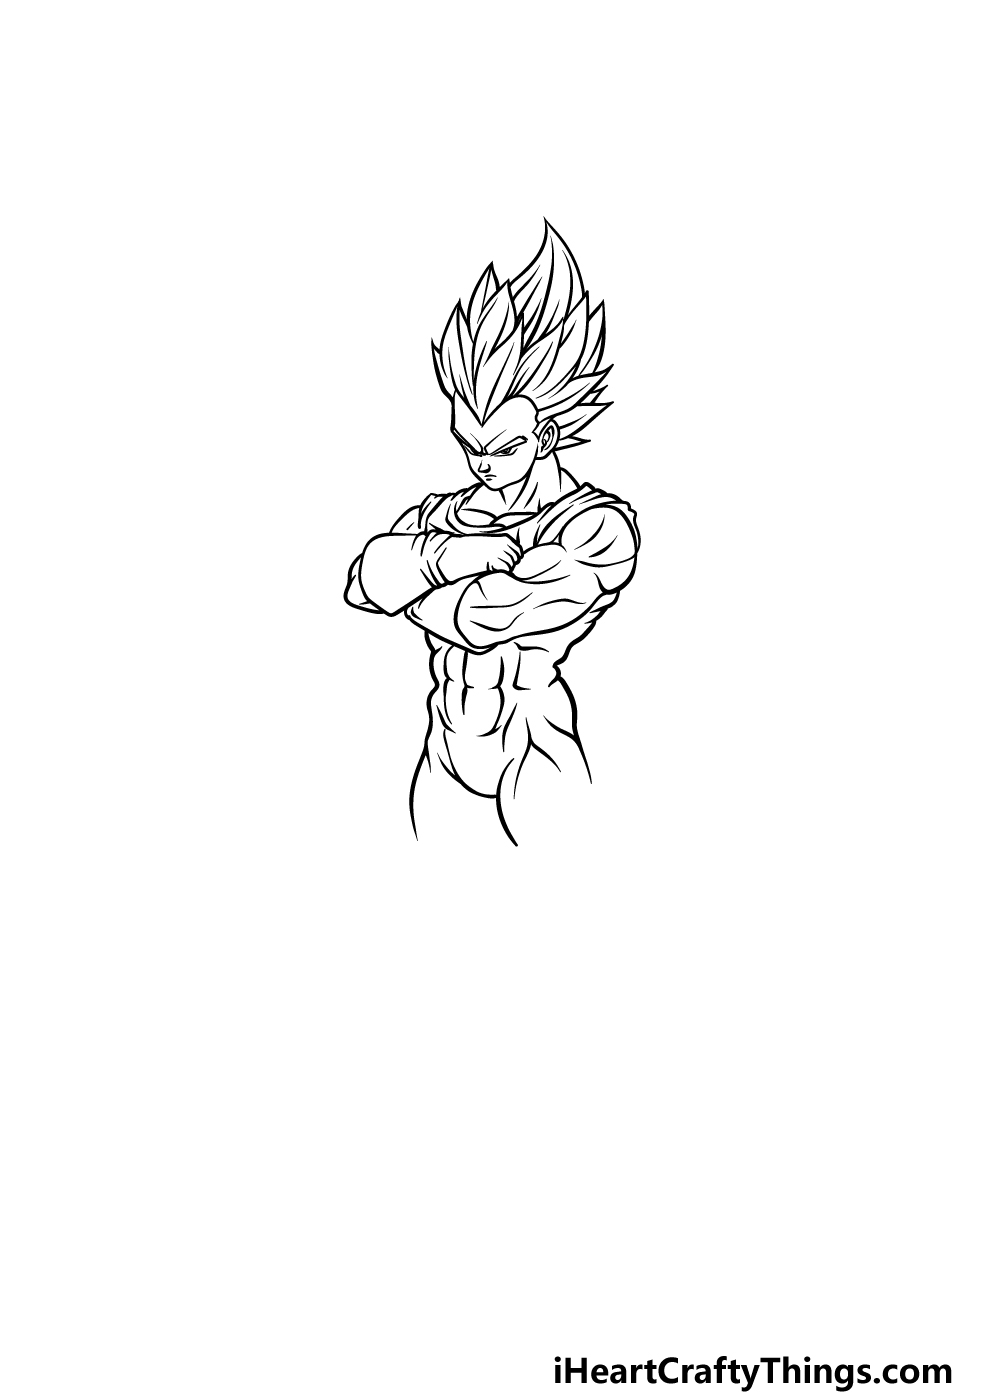 drawing Vegeta step 3